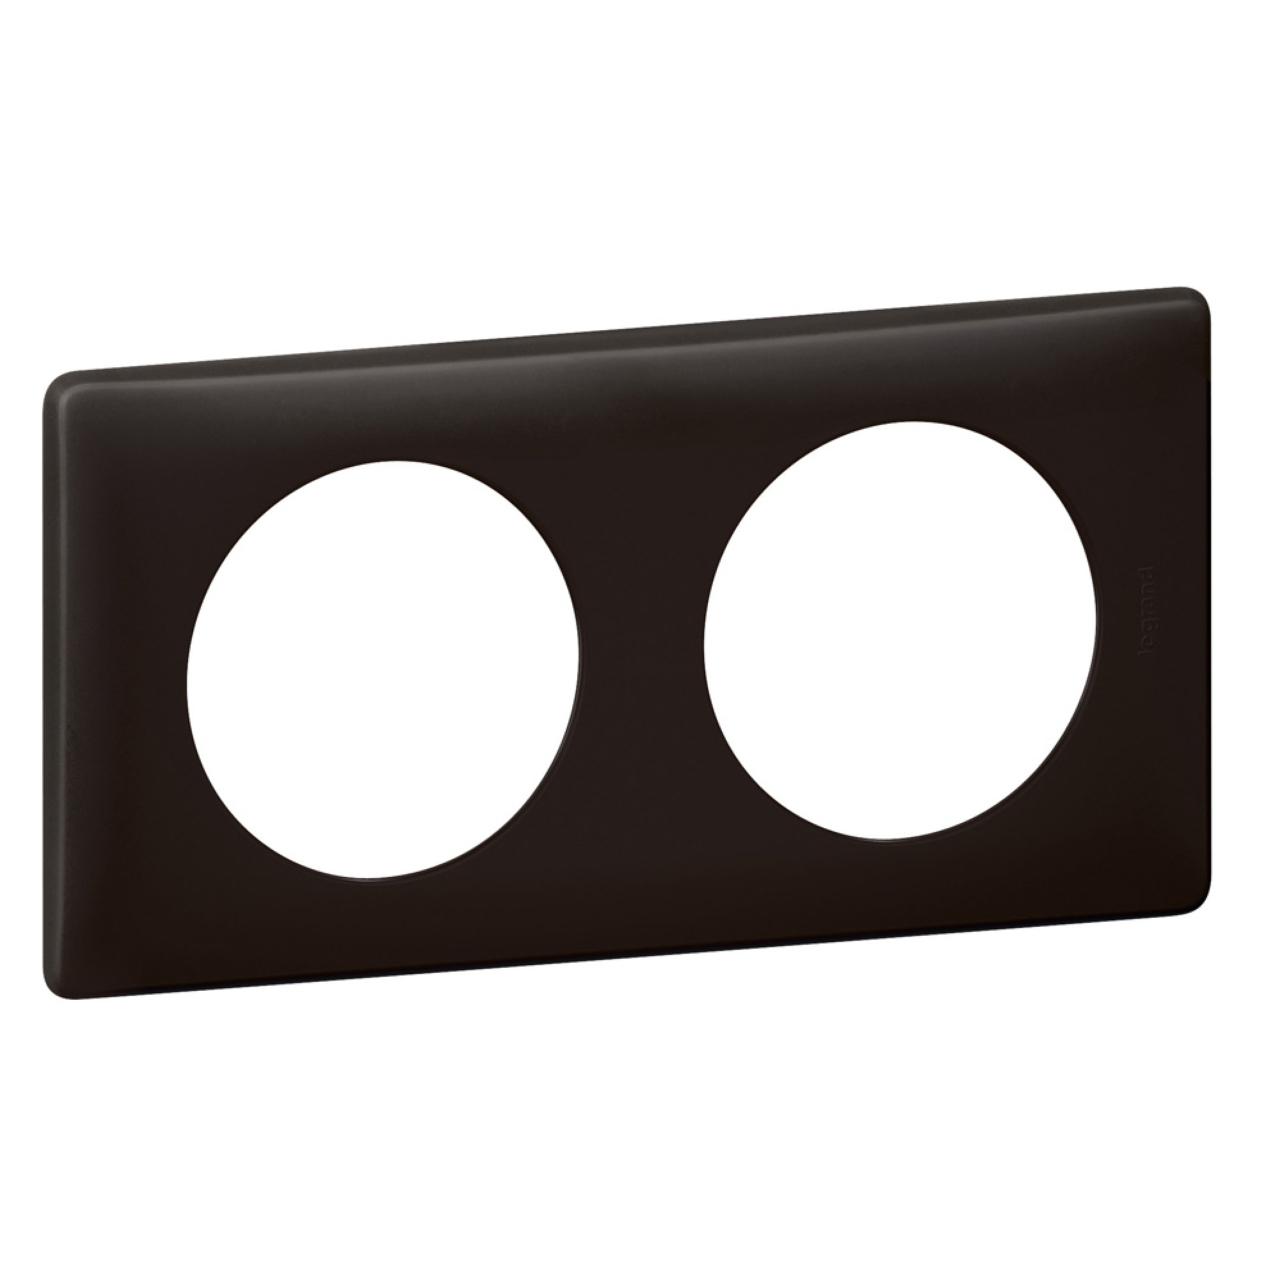 plaque legrand c liane 2 postes basalte 9 94. Black Bedroom Furniture Sets. Home Design Ideas